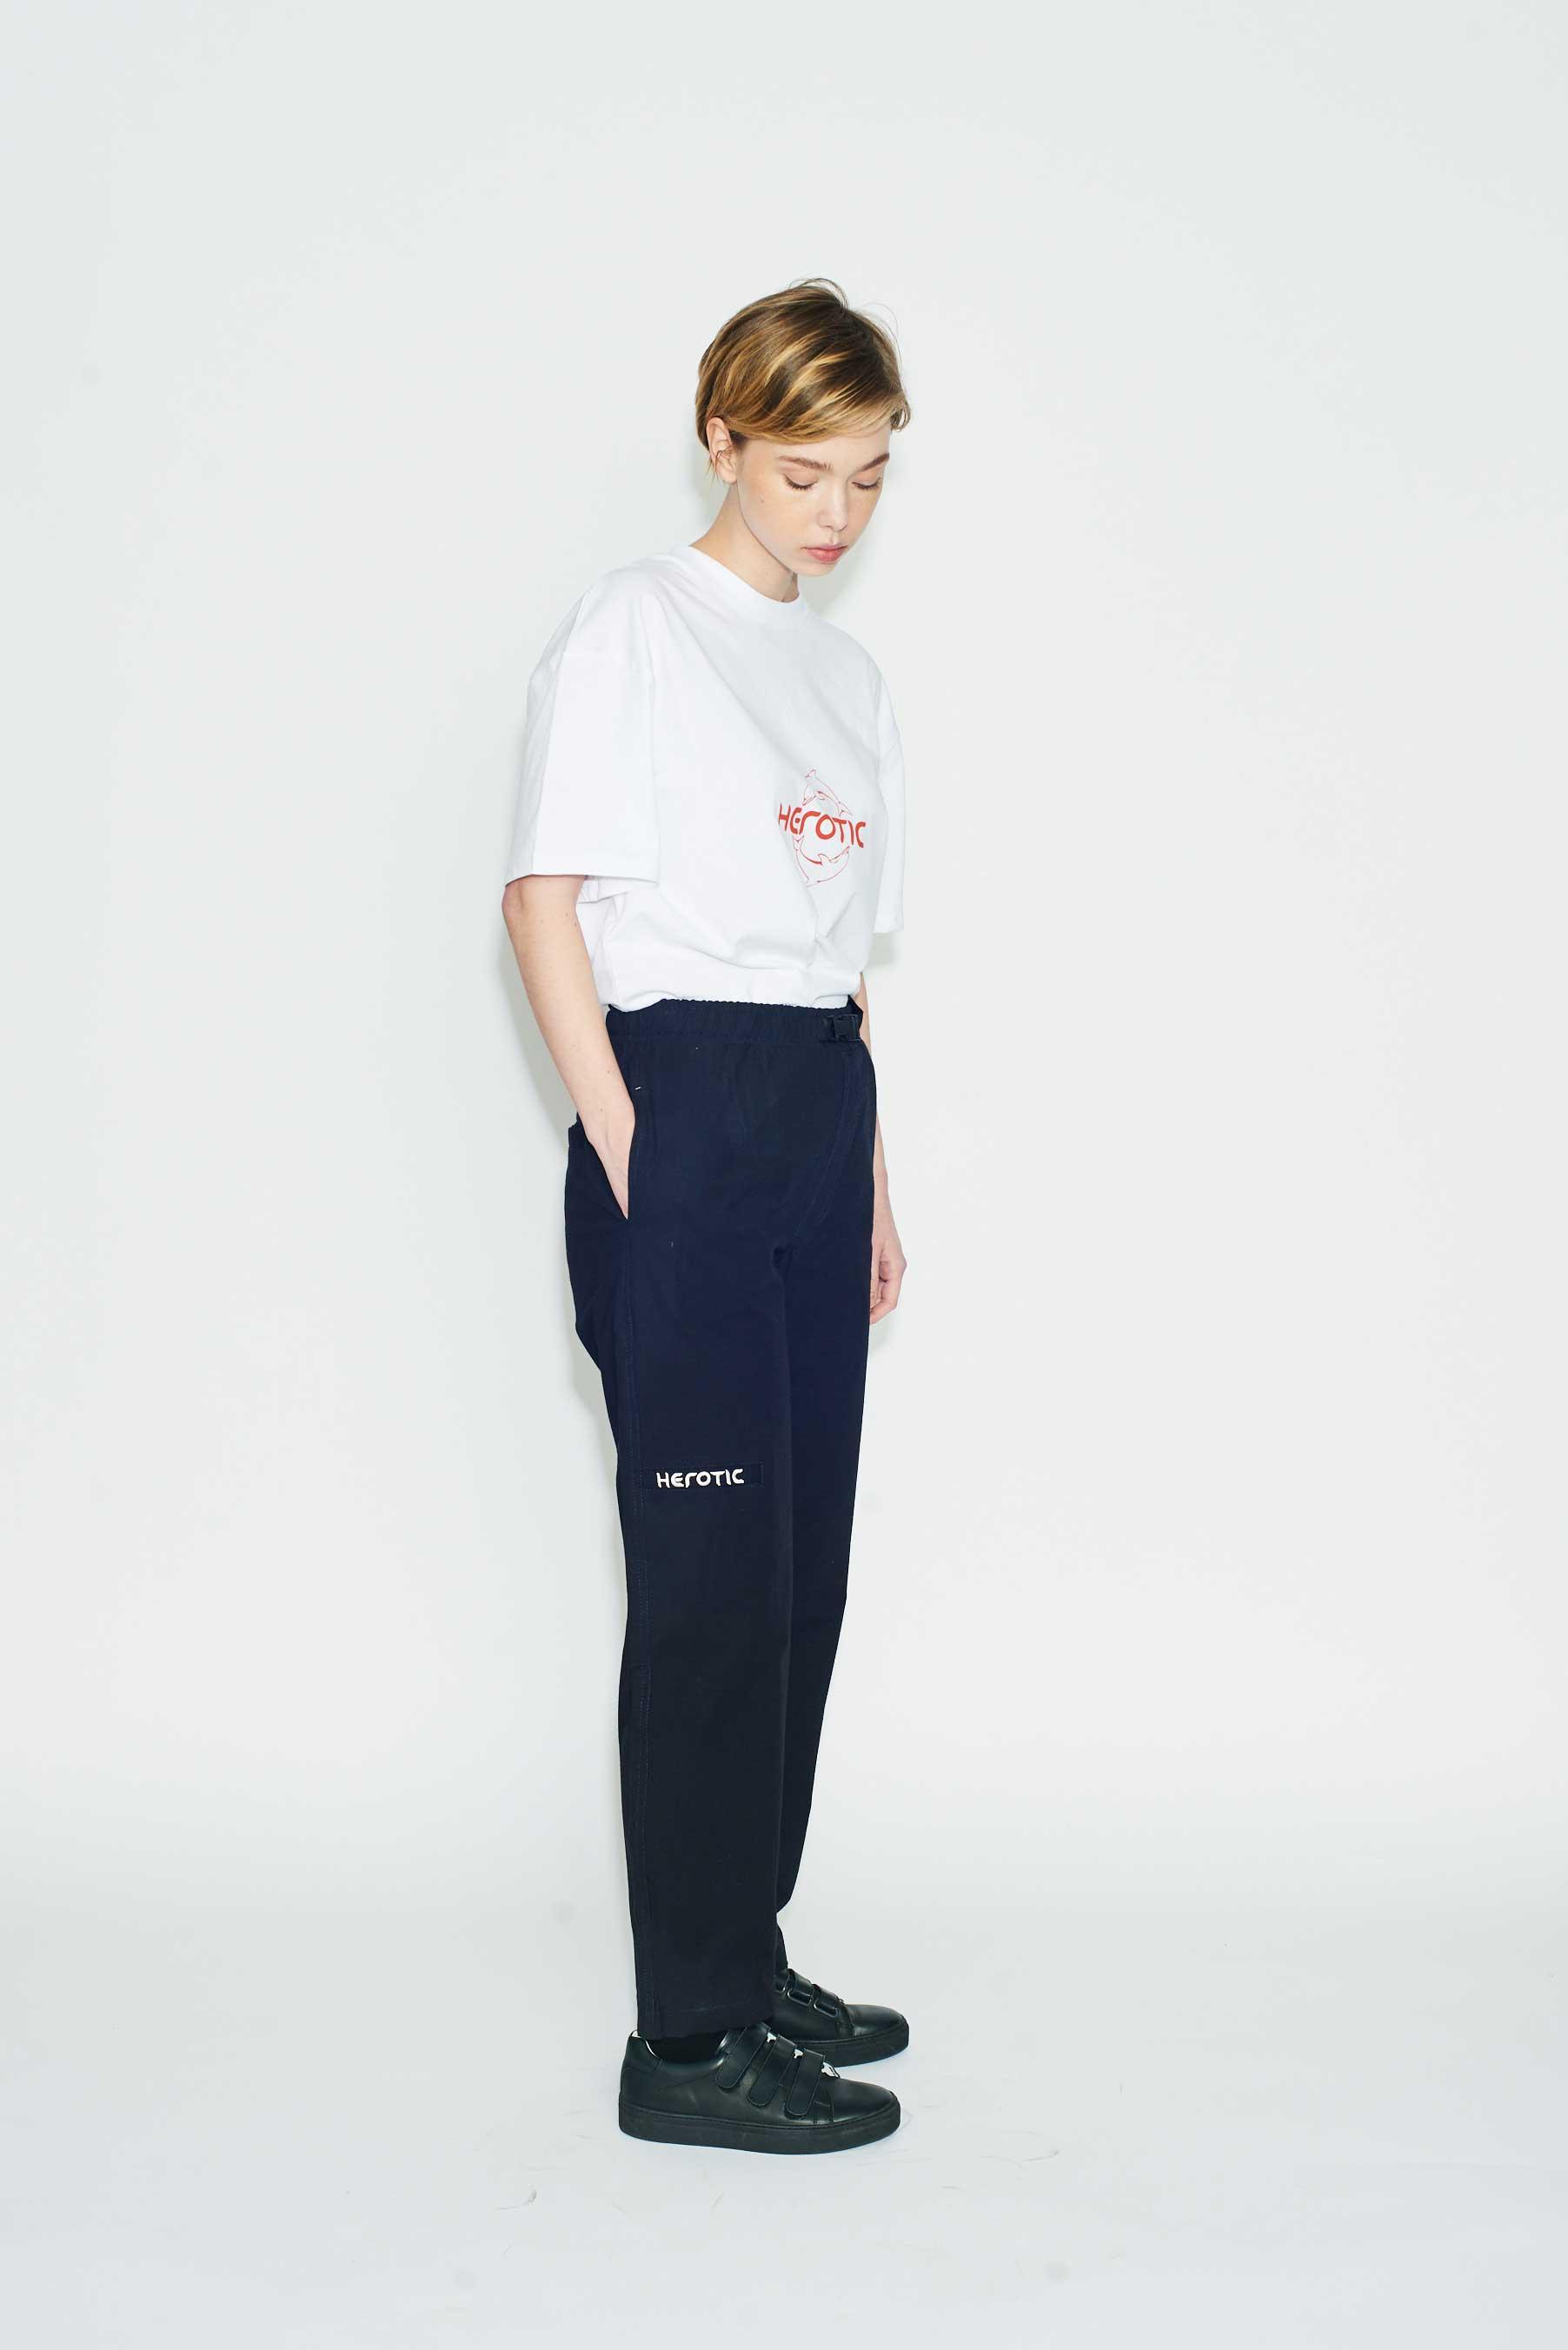 Herotic - Dolphin Pants - Black Navy